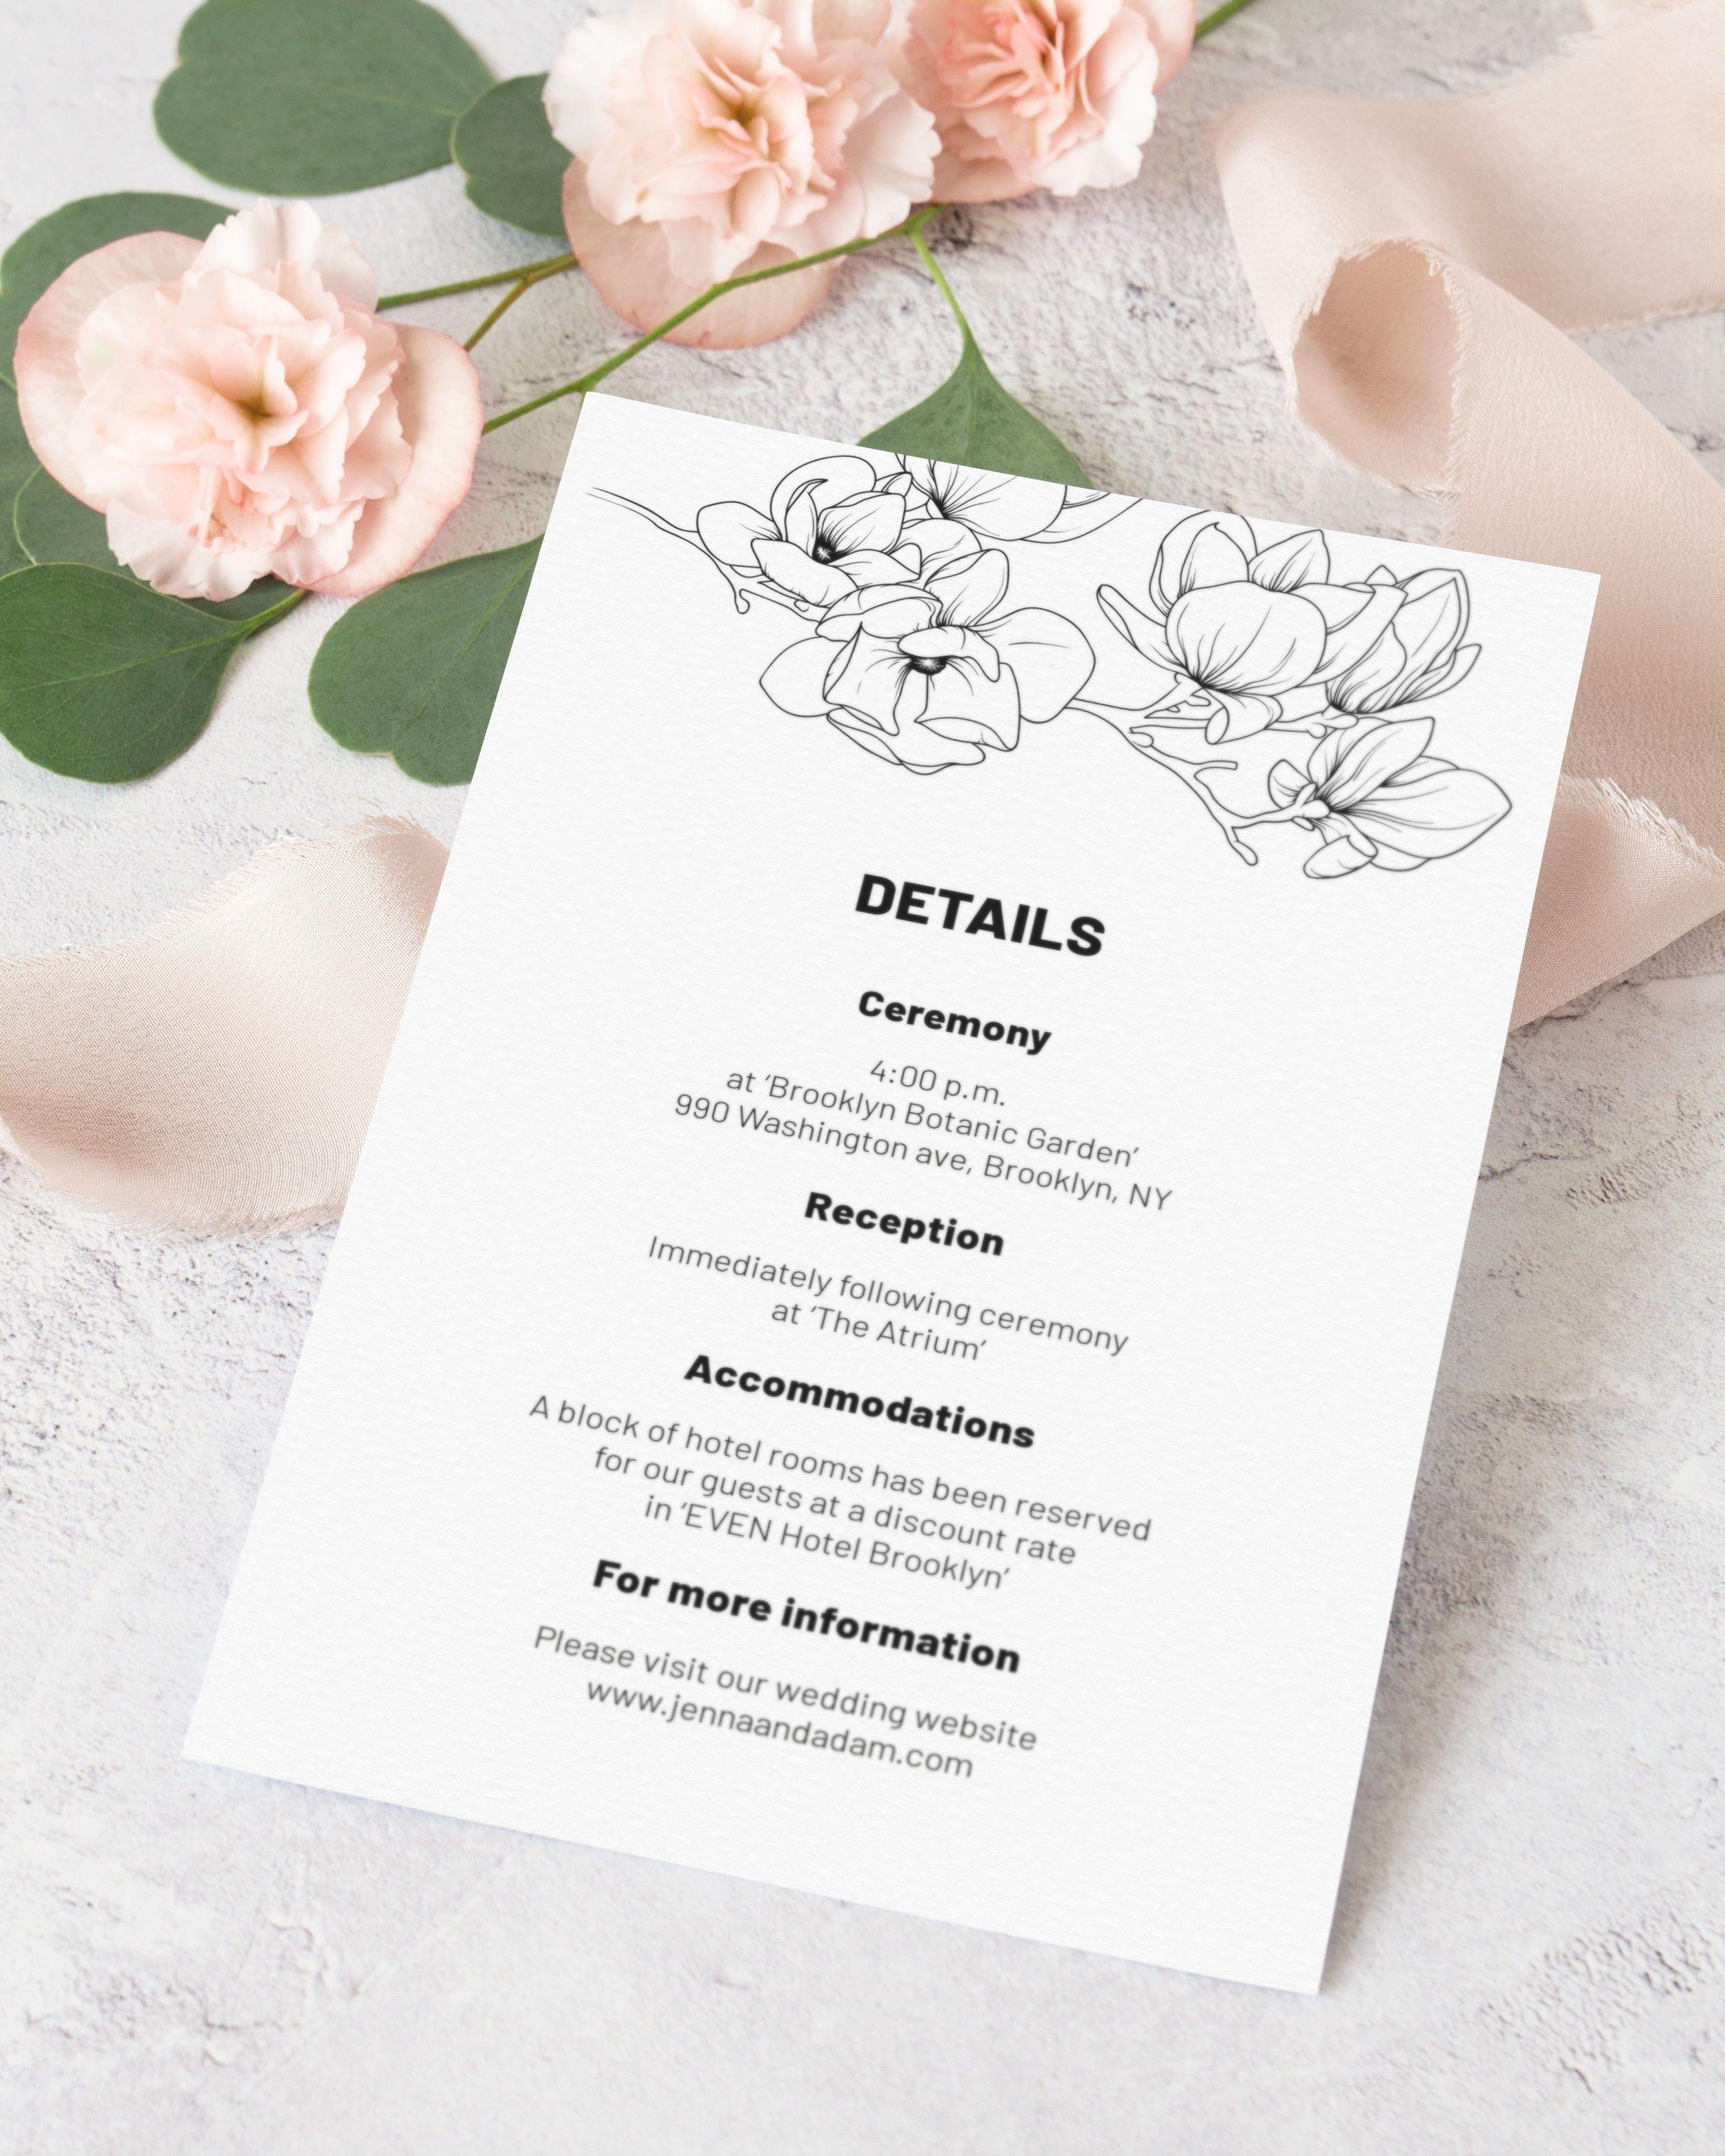 Magnolia Wedding Details Card Template Black And White Floral Wedding Invitation Diy Details Card Spring Wedding Invitation Insert Mg18 Wedding Details Card Floral Wedding Invitations Diy Spring Wedding Invitations